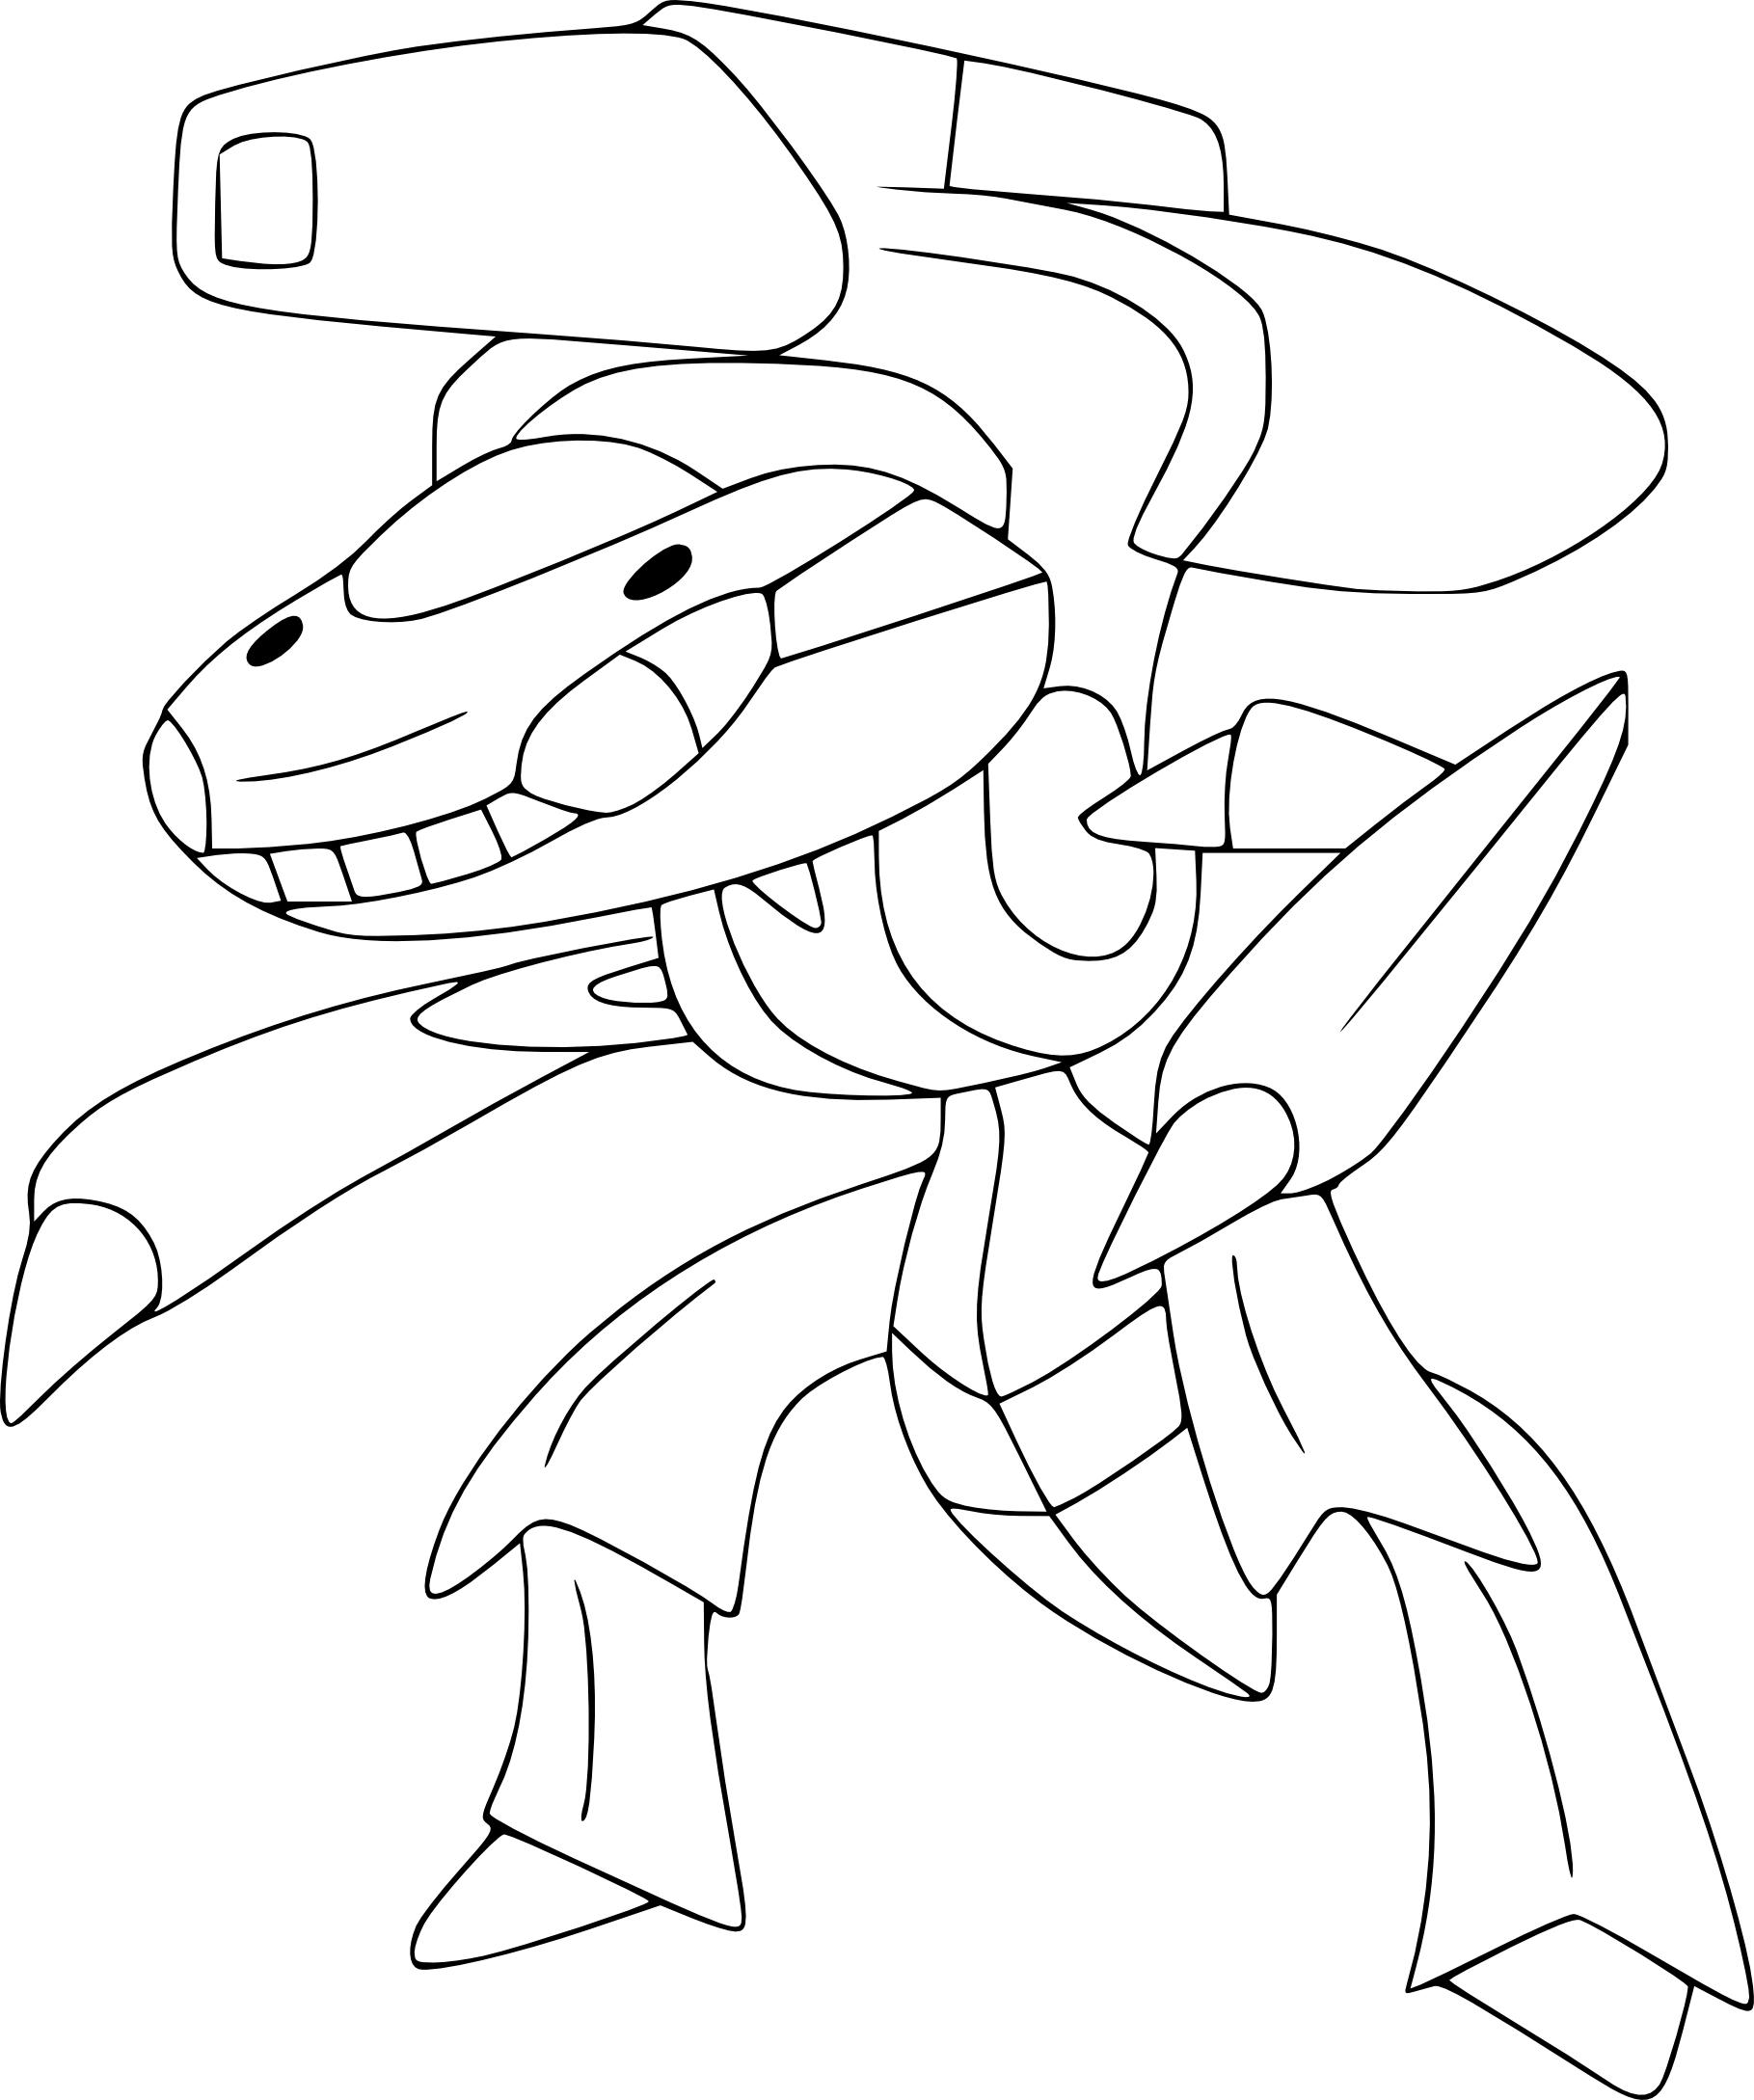 Coloriage genesect pokemon imprimer - Dessin pokemon legendaire ...